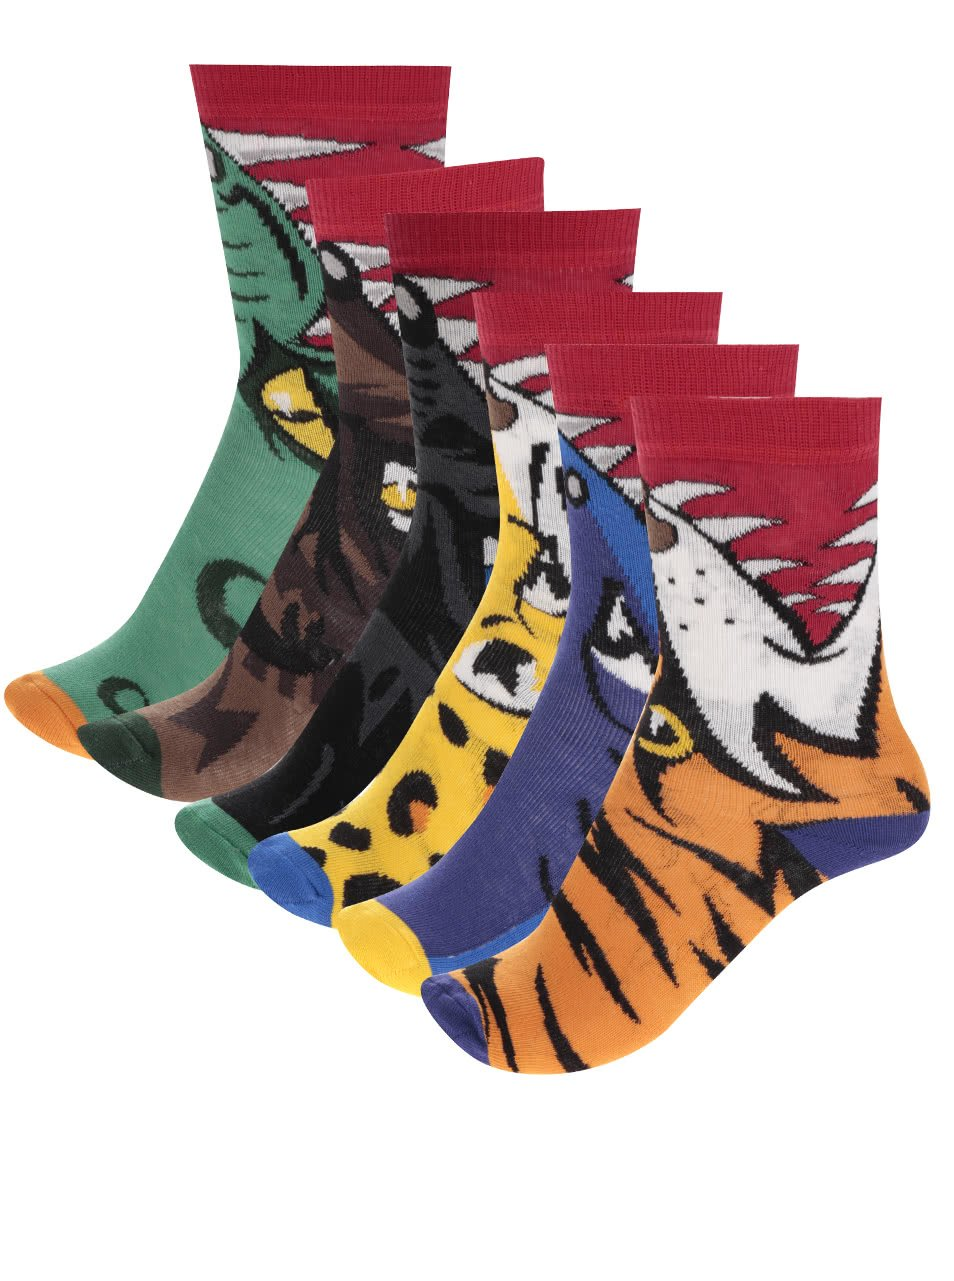 Sada šesti klučičích ponožek s motivy predátorů Oddsocks Snappers